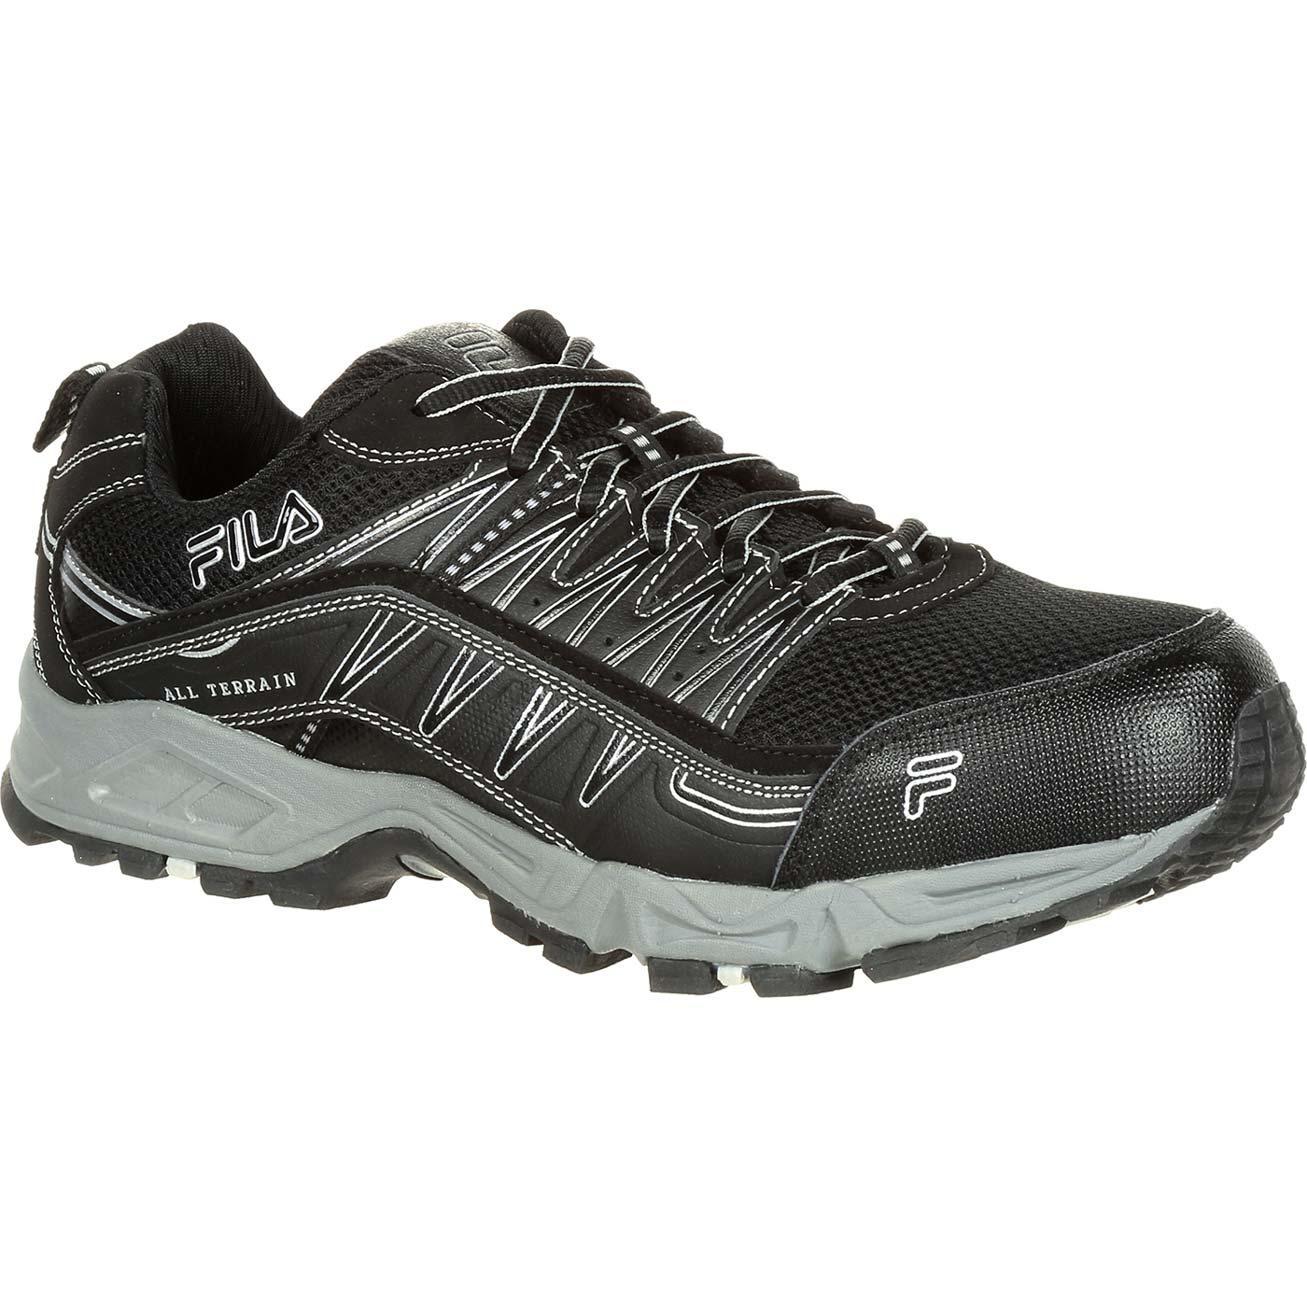 25b699ec30 Fila At Peak Steel Toe Work Athletic Shoe